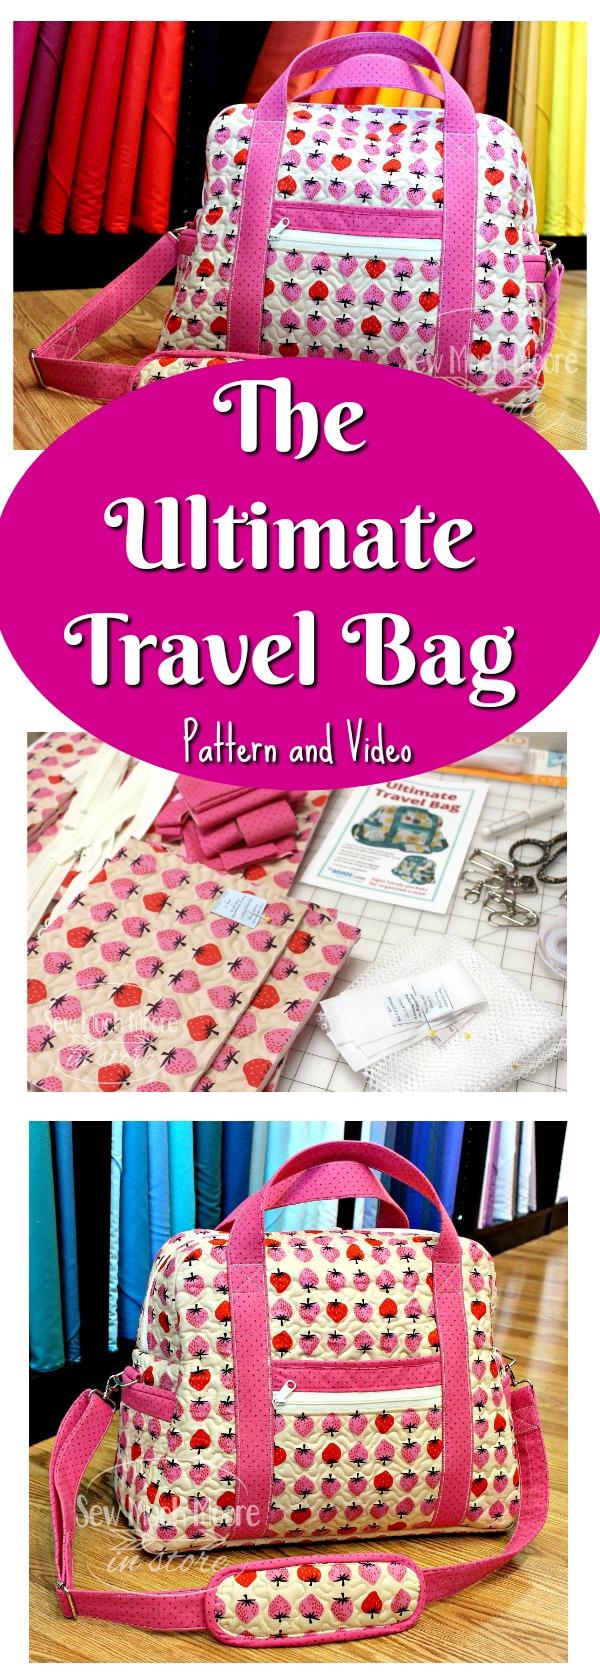 Ultimate Travel Bag Pinterest Pin